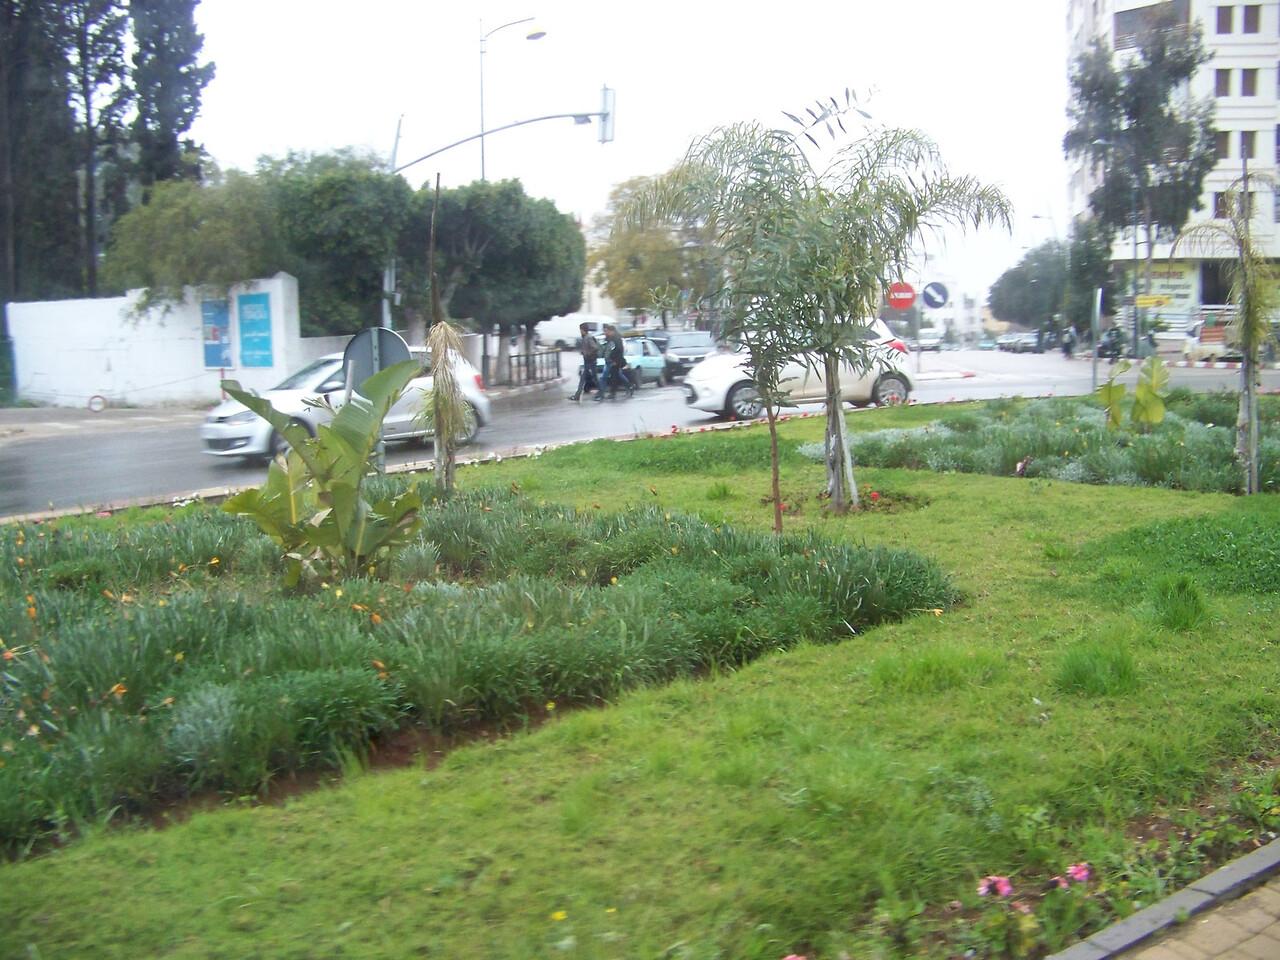 0043 - Streets of Modern Section of Meknes - Meknes Morocco.JPG